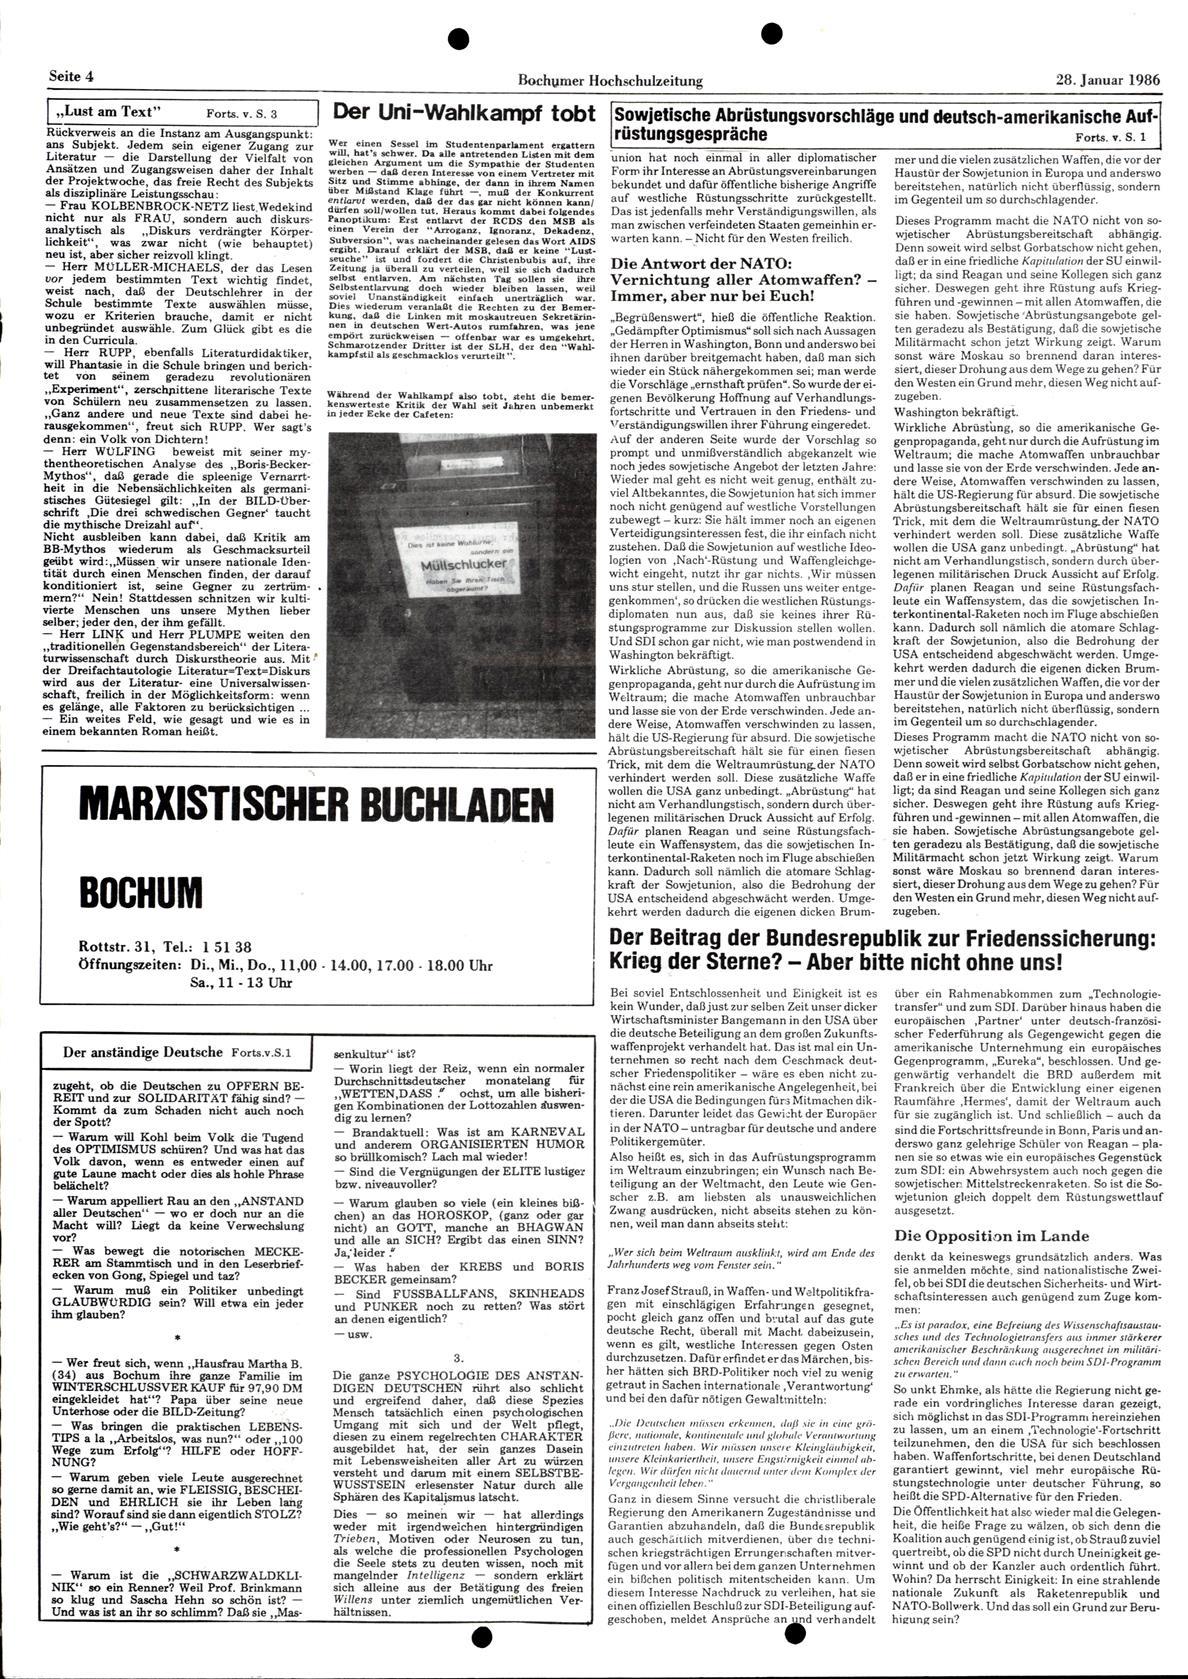 Bochum_BHZ_19860128_124_004